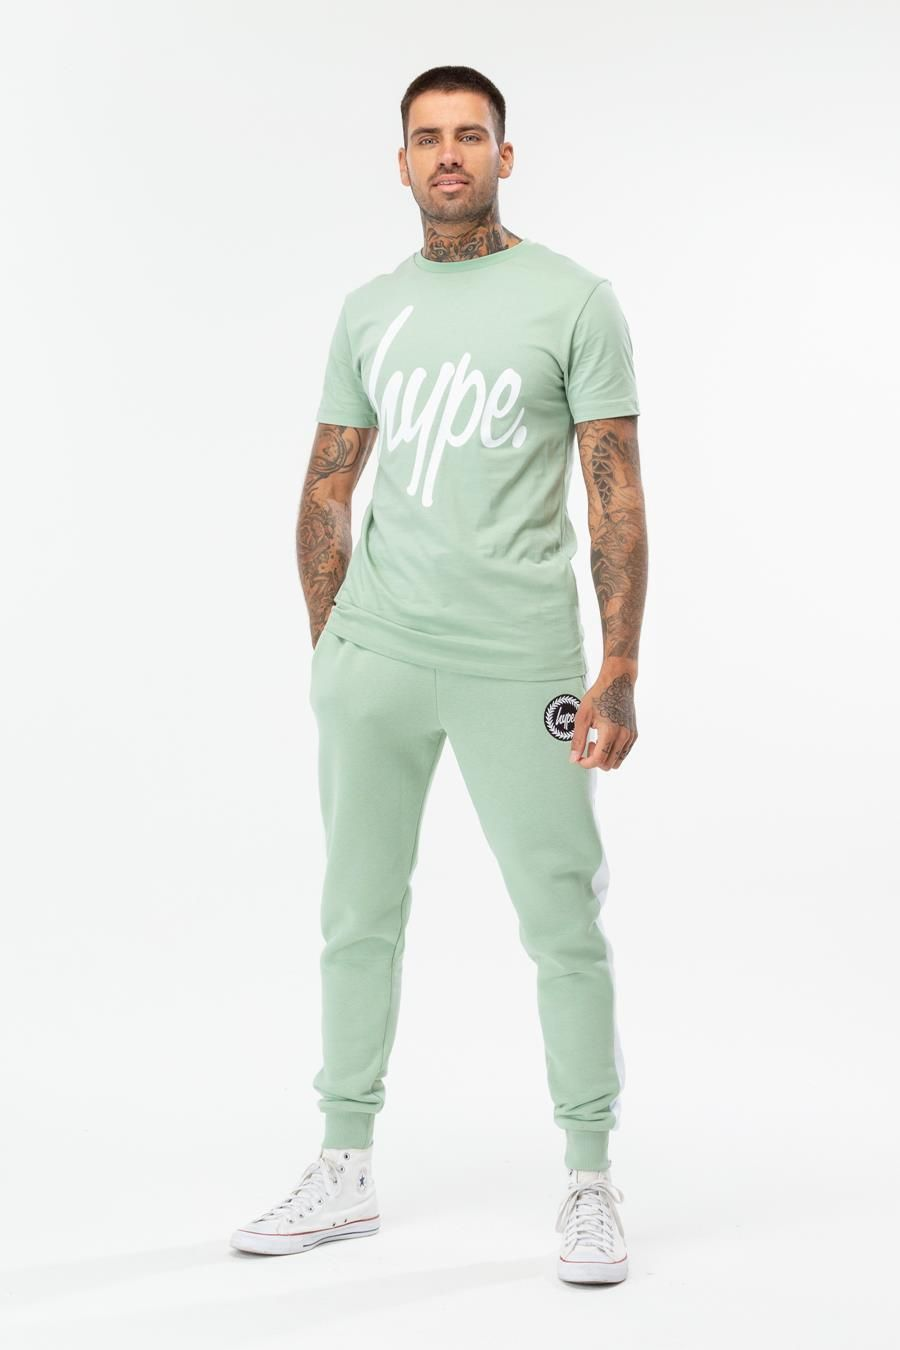 Hype Olive Script Mens T-Shirt